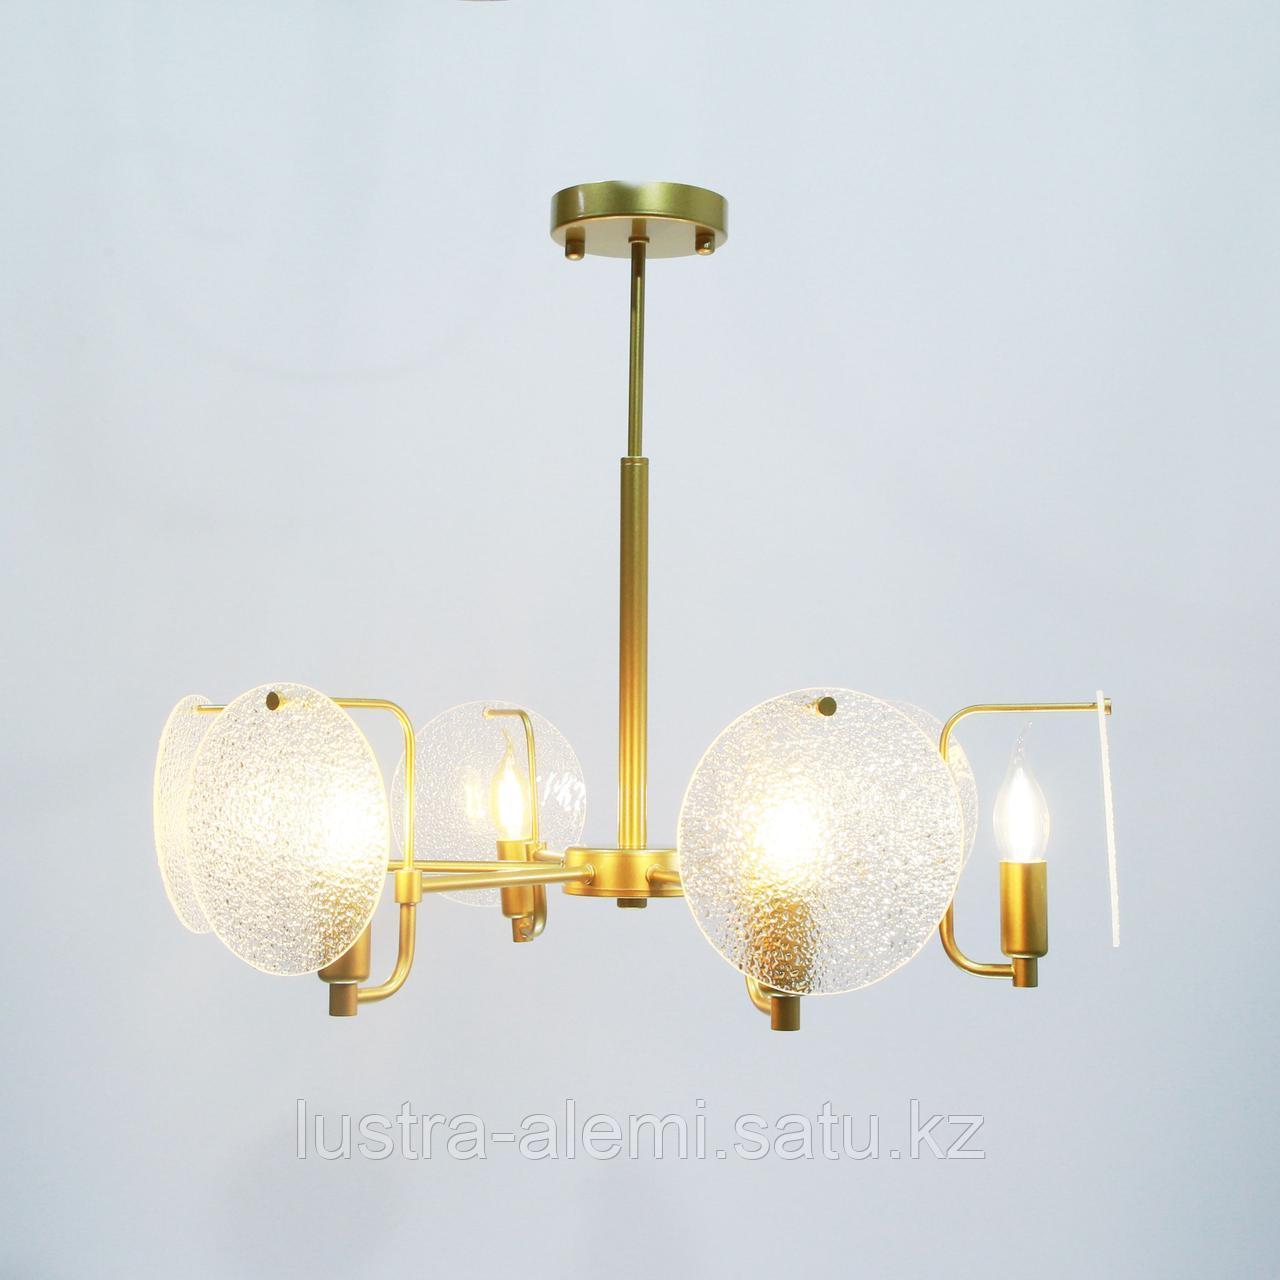 Люстра Hi-Tech LSN 5123/6 Light Gold E14*6 H=614*516